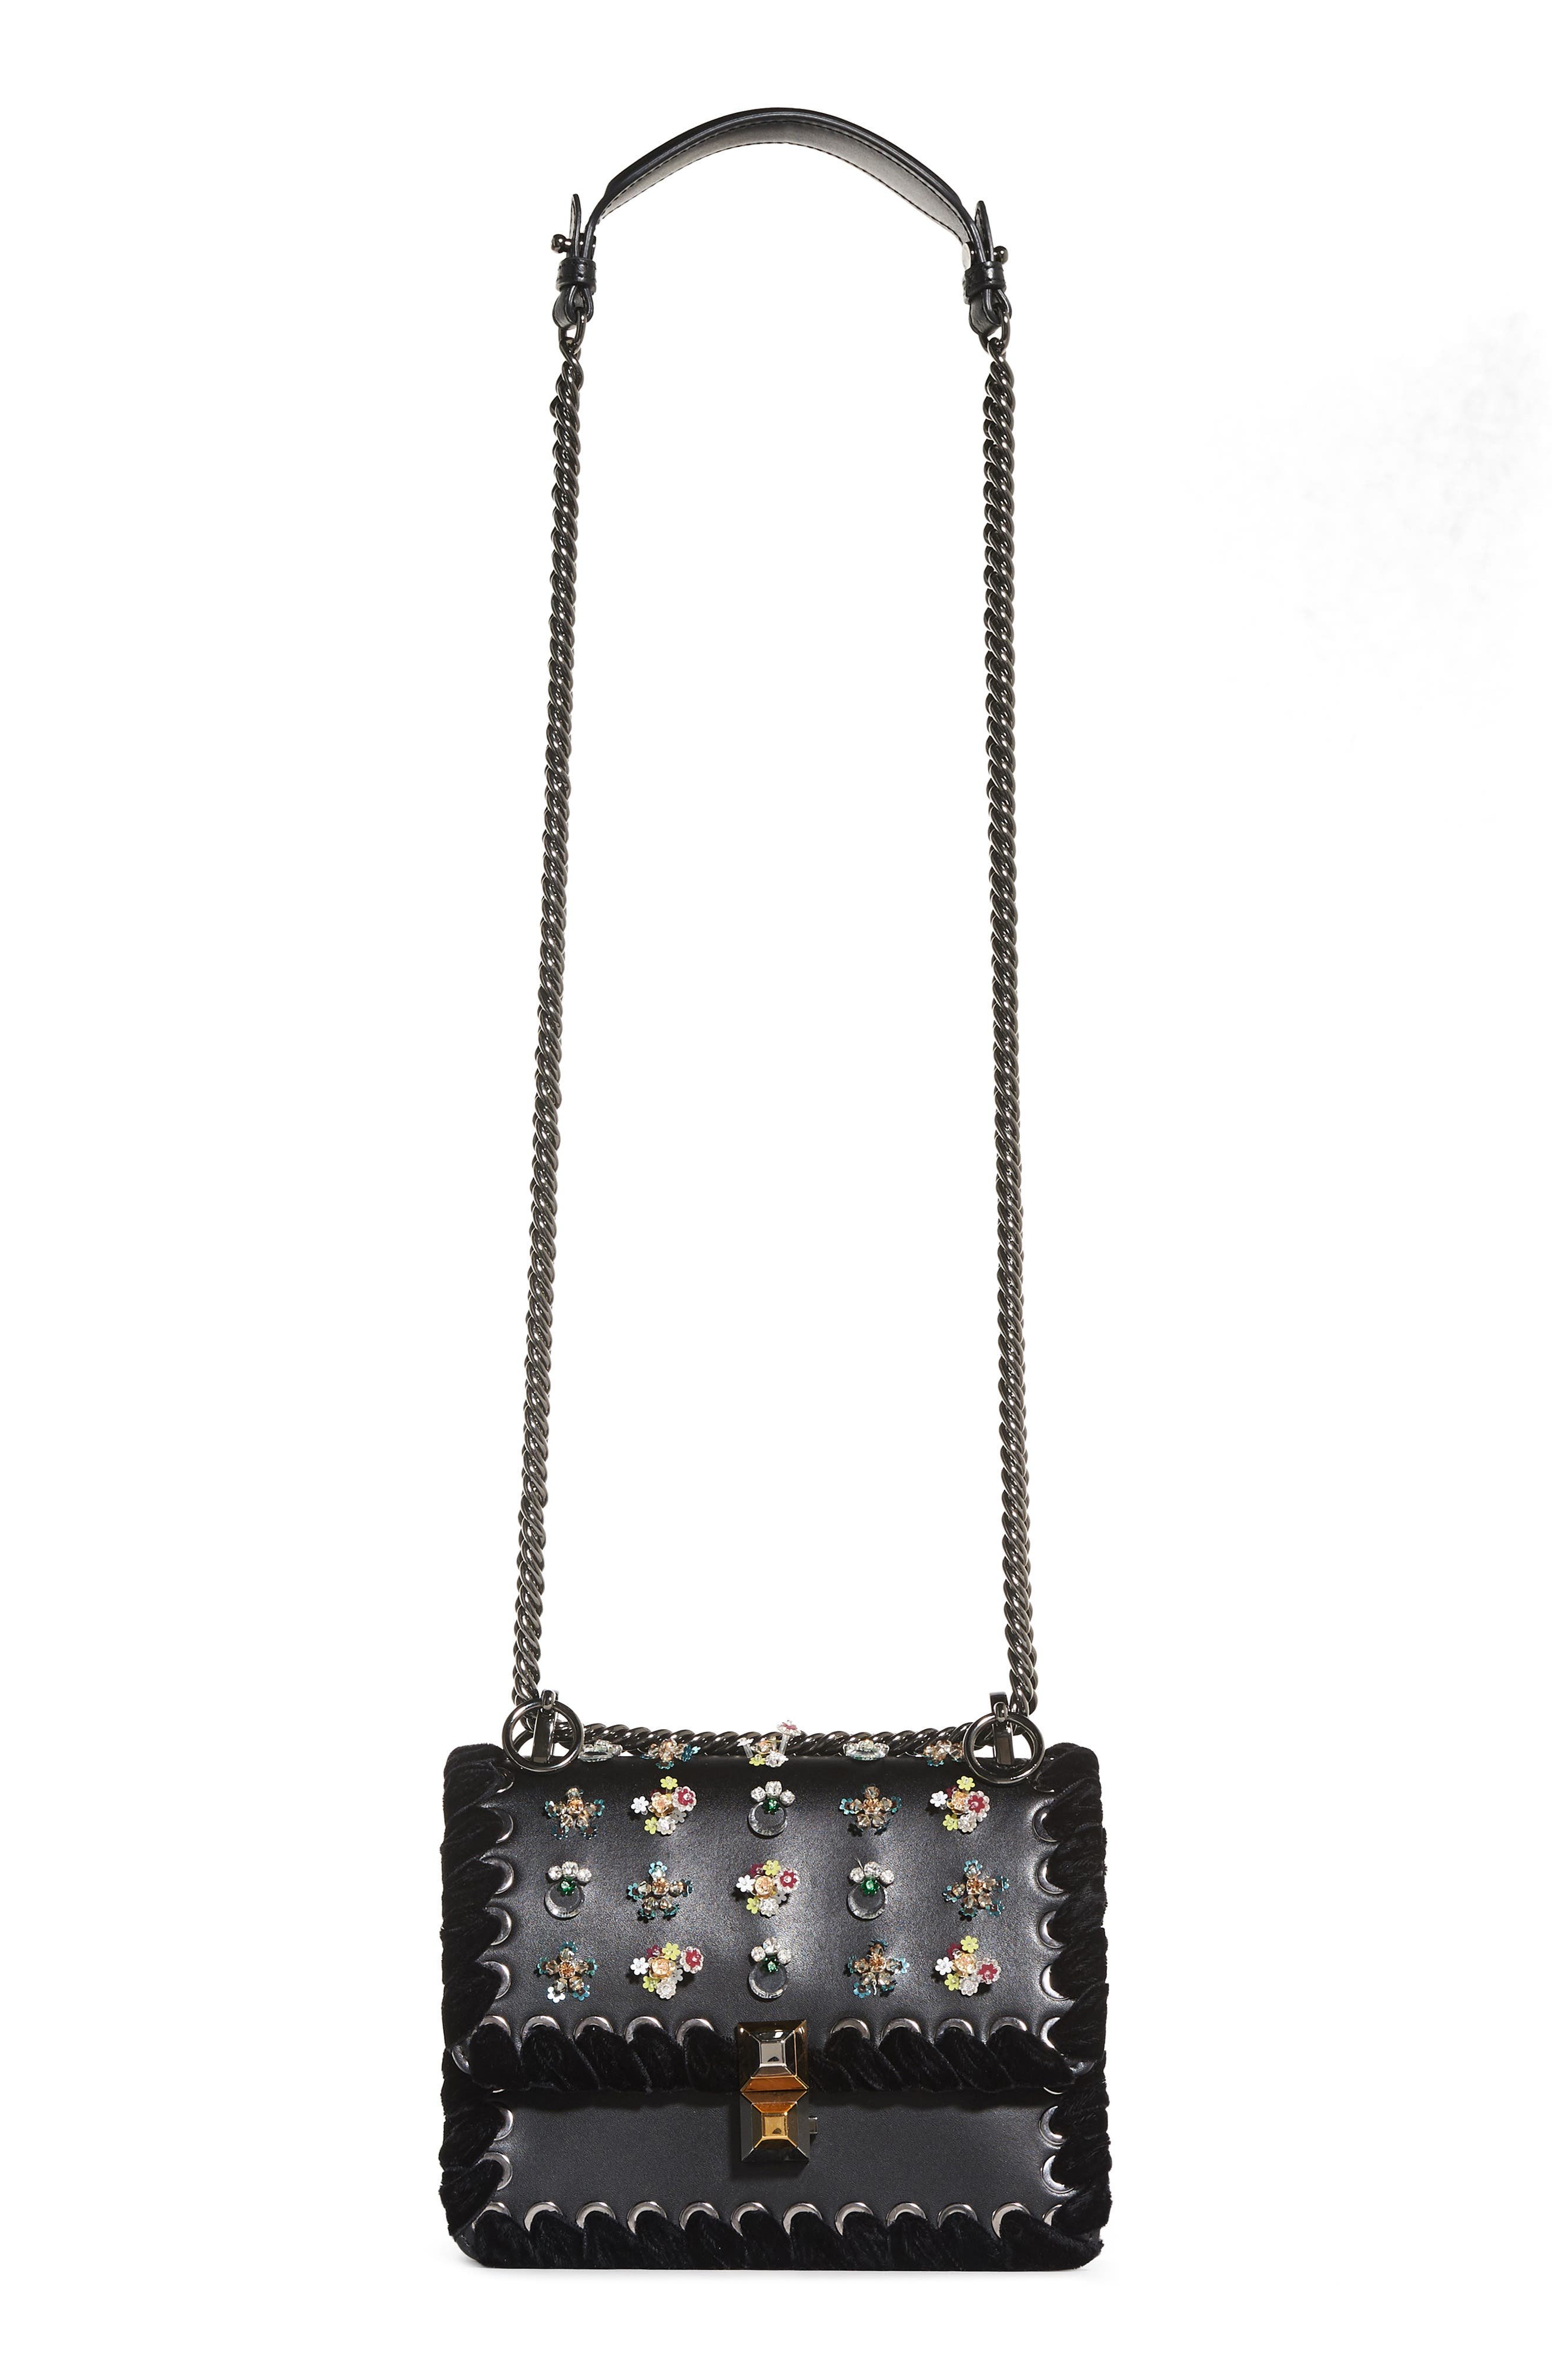 Fendi Mini Kan Beaded Flowers Calfskin Leather Shoulder Bag